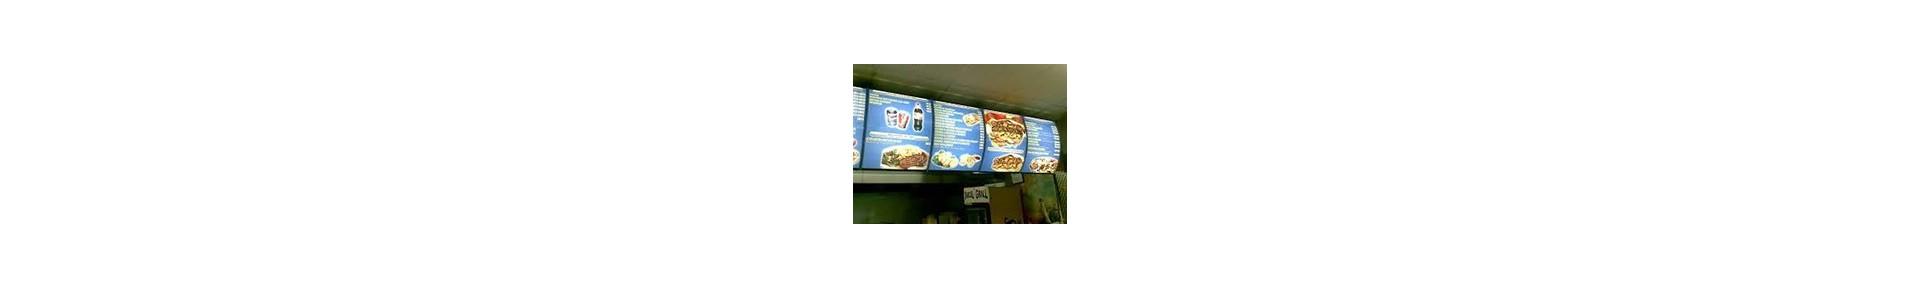 Restaurant Menu Boards   Digital Menu boards   Lightboxes